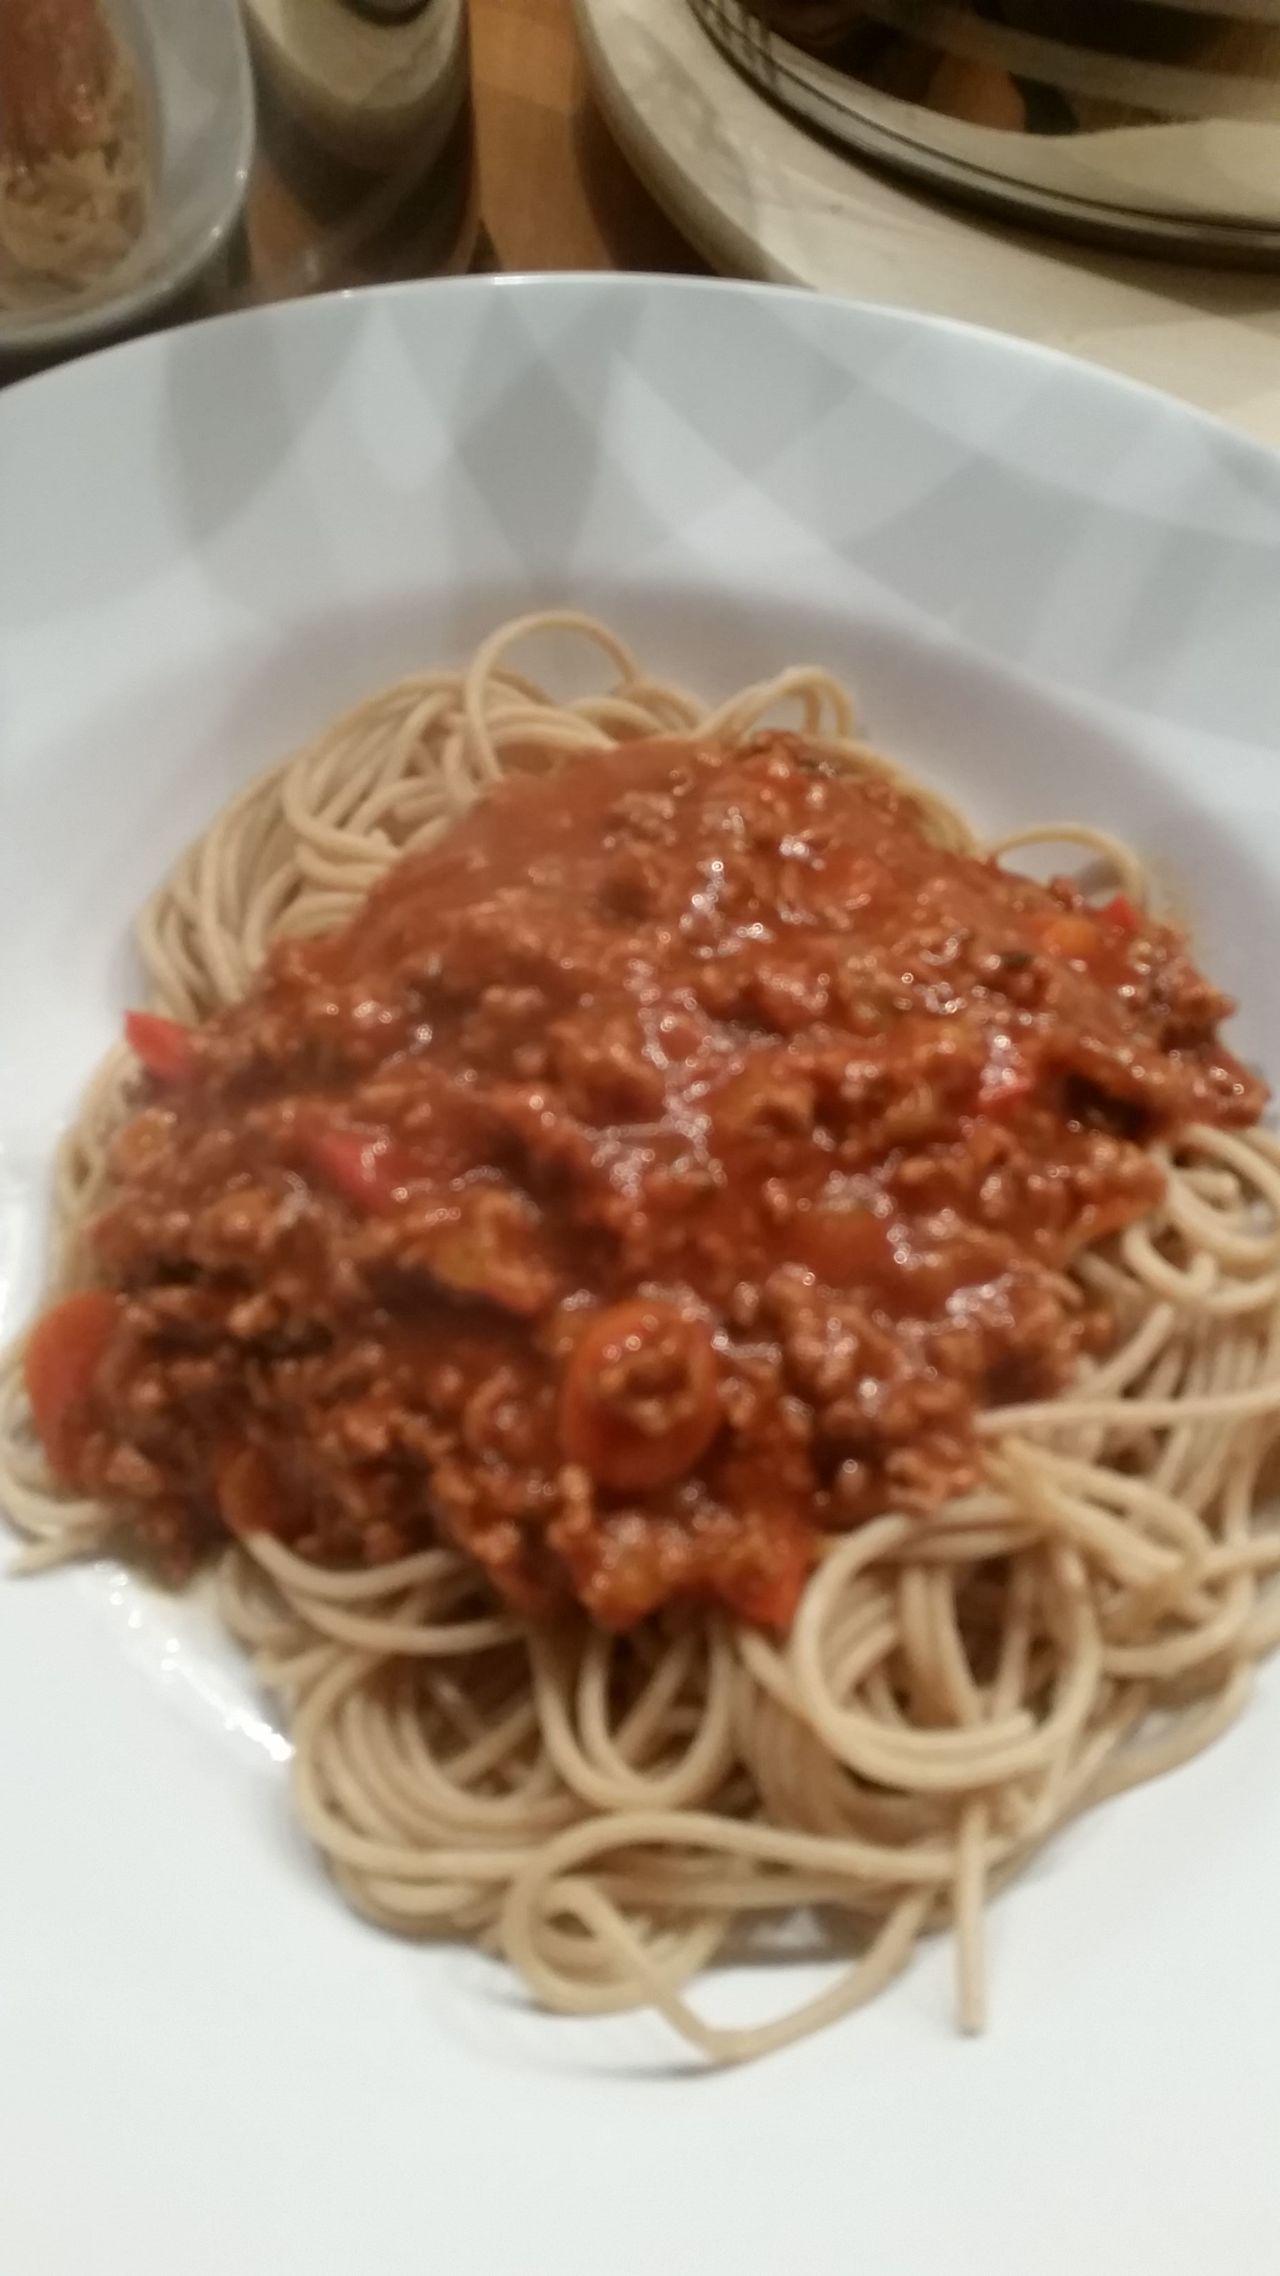 Gesund essen Hello World Taking Photos Spaghetti Bolognese Spaghetti. Essen